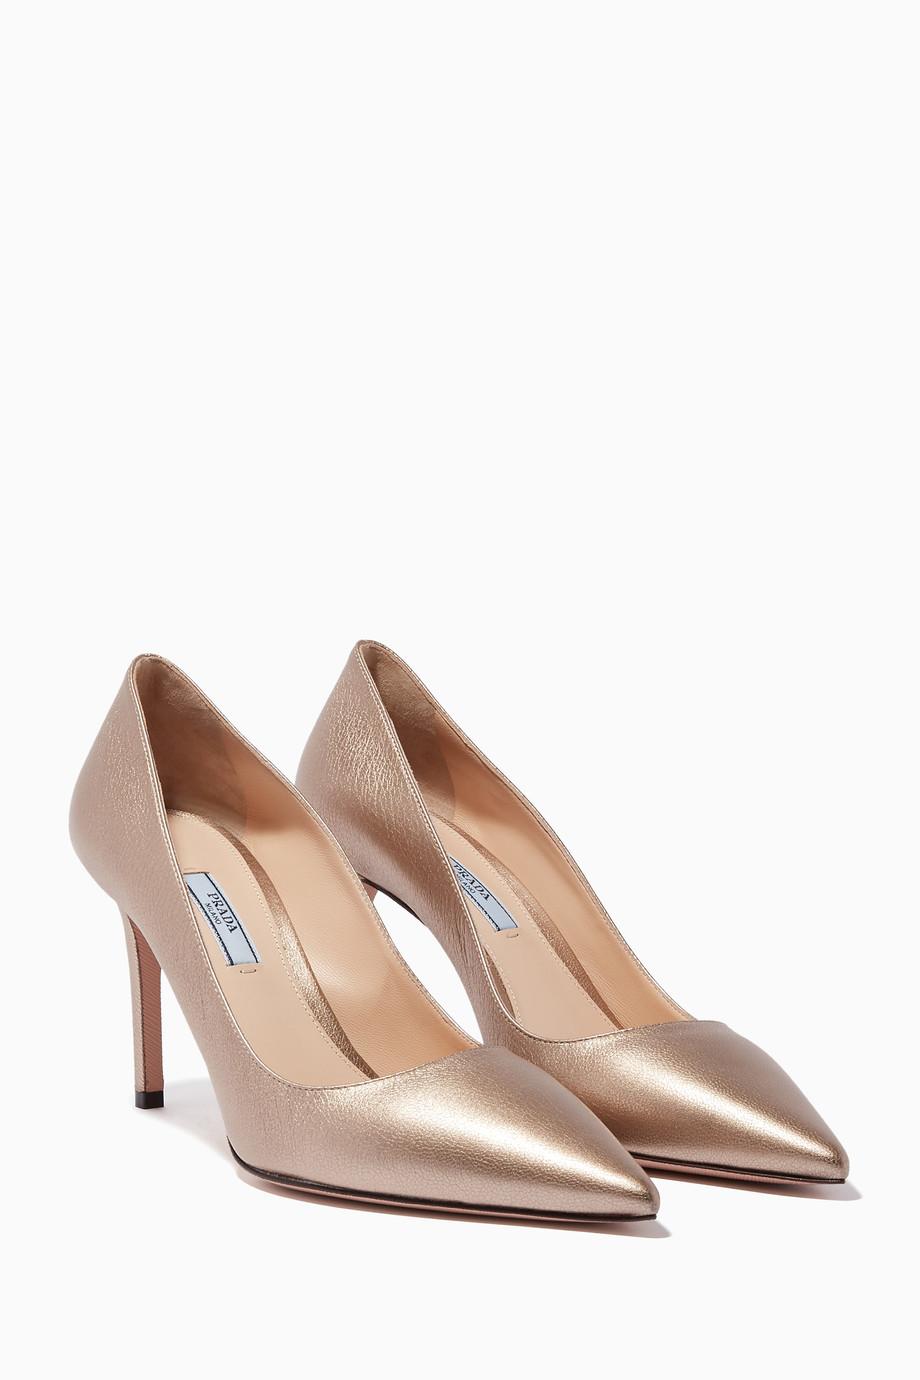 fed0e84cd Shop Prada Gold Metallic-Gold Leather Pumps for Women